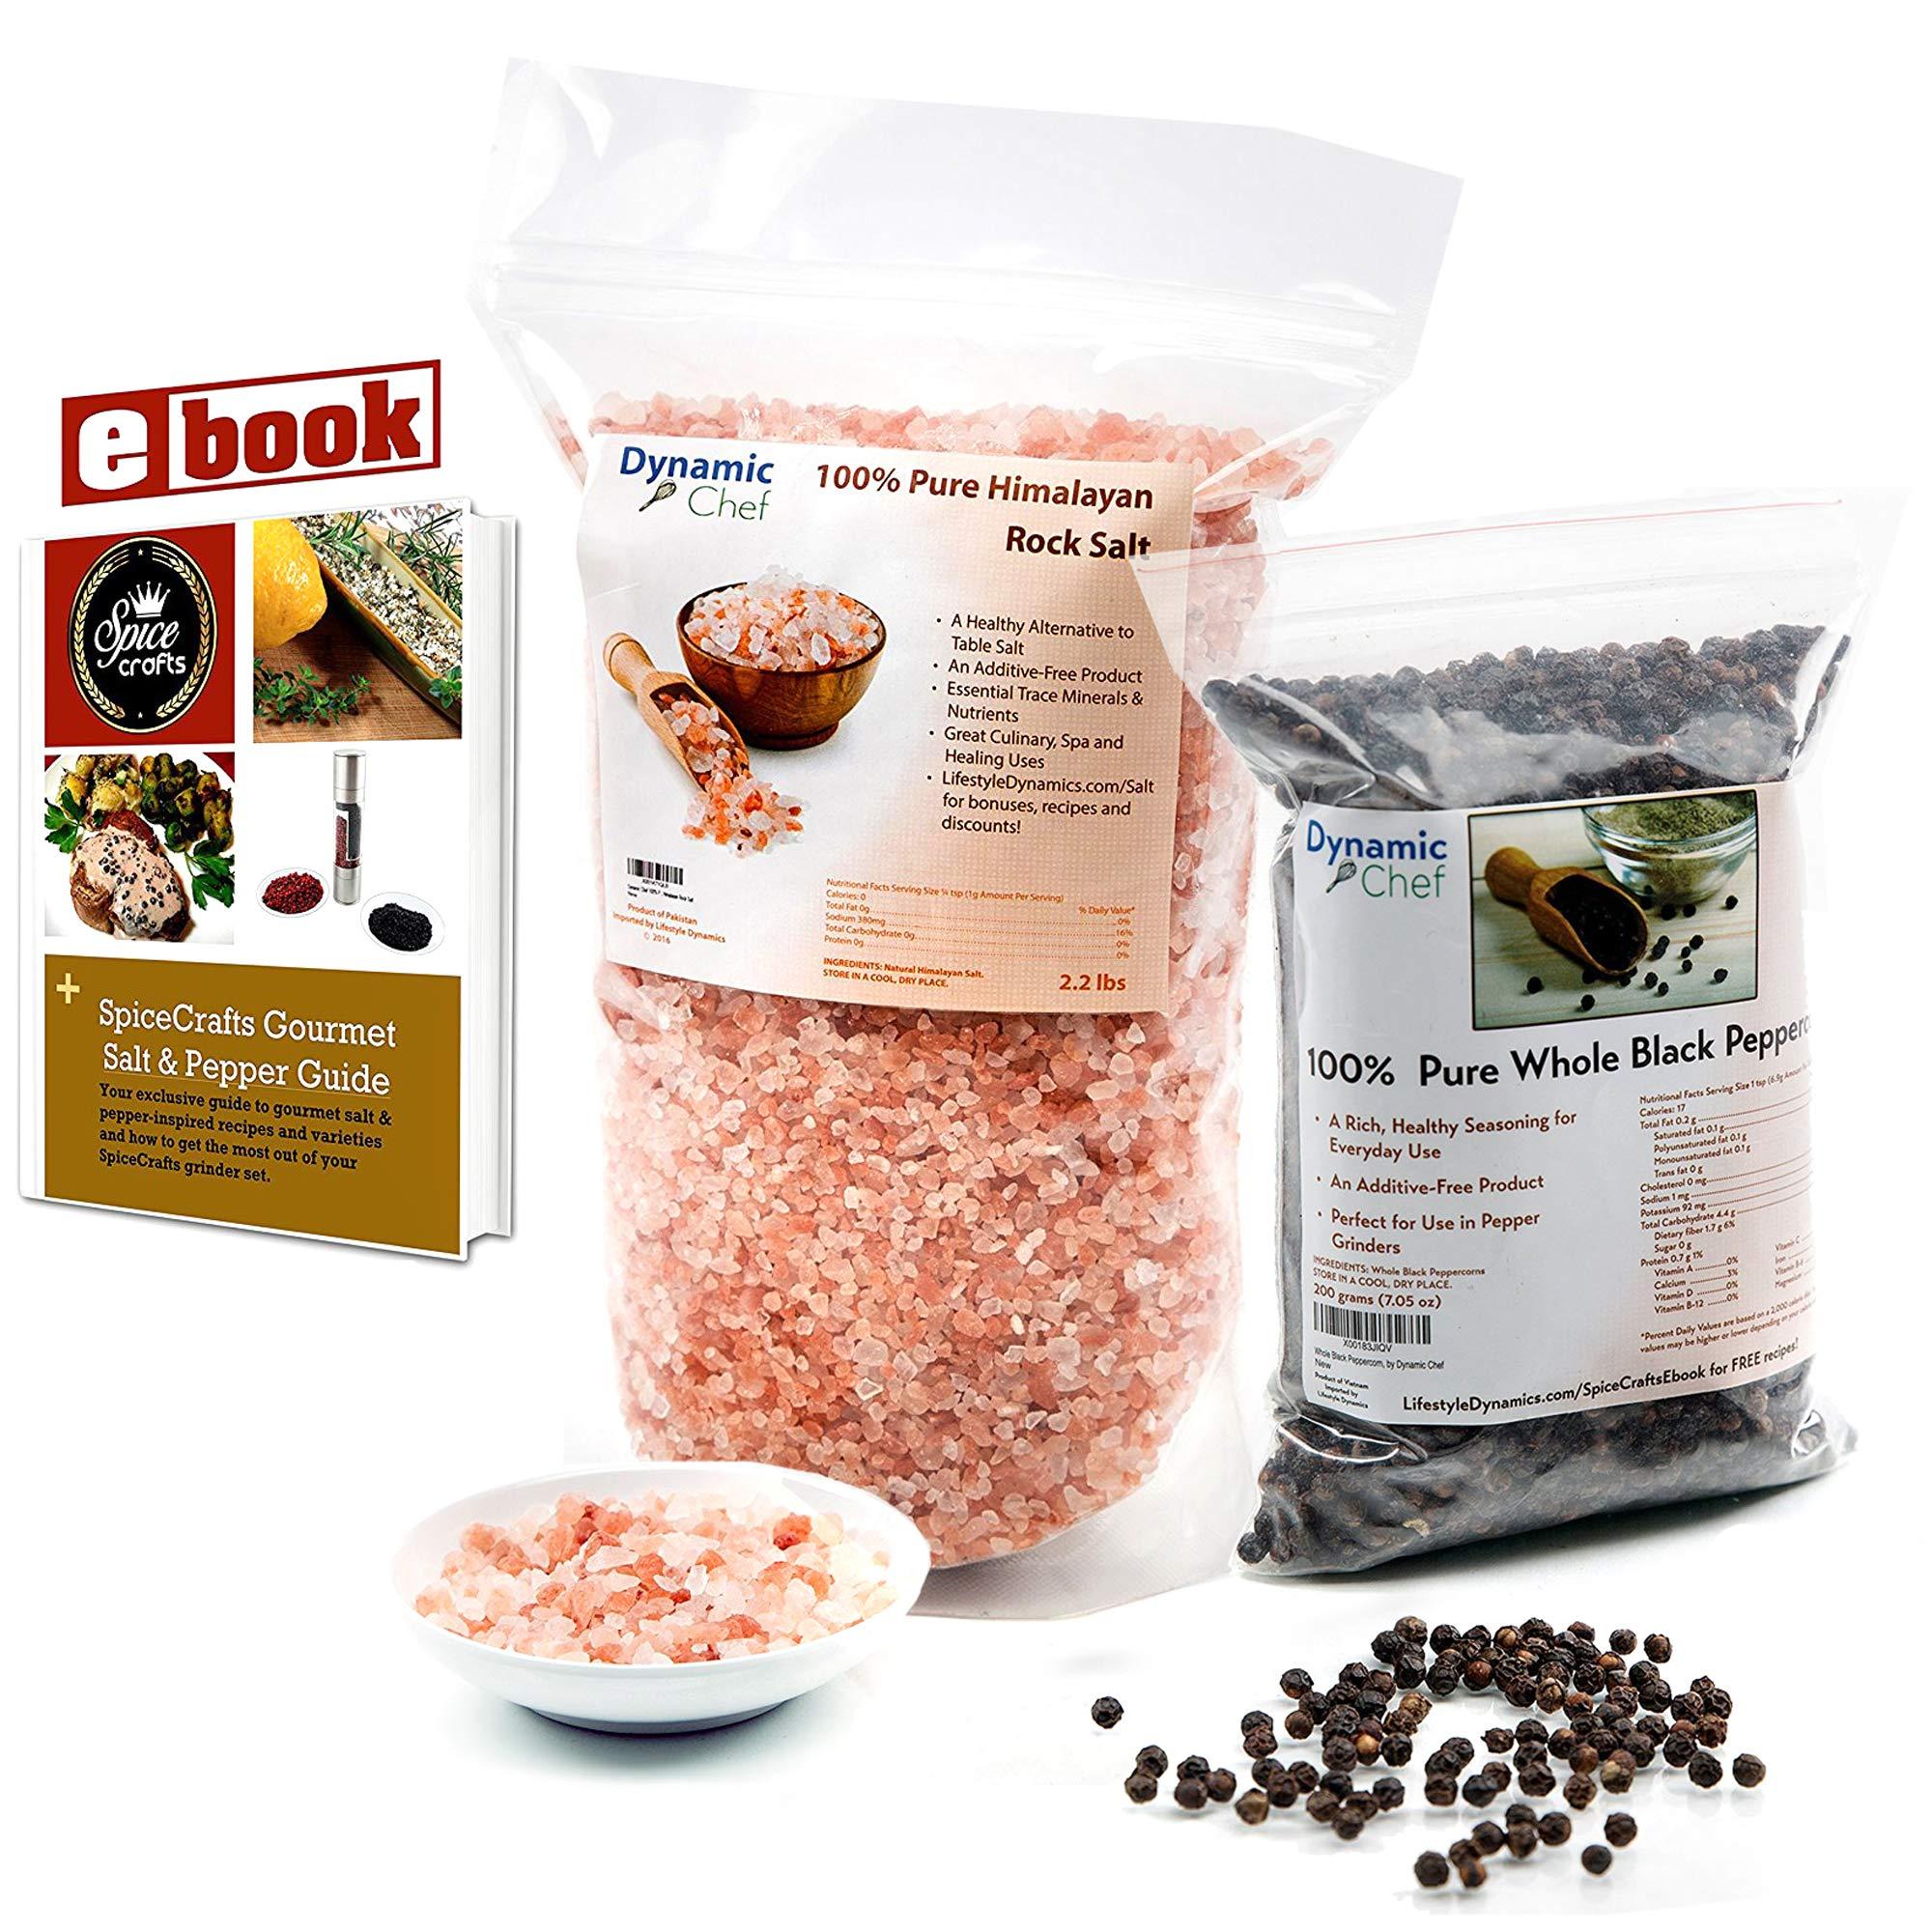 Himalayan Rock Salt, Black Peppercorns Tellicherry Bundle. 7oz Peppercorns, 1lb Pink Rock Salt